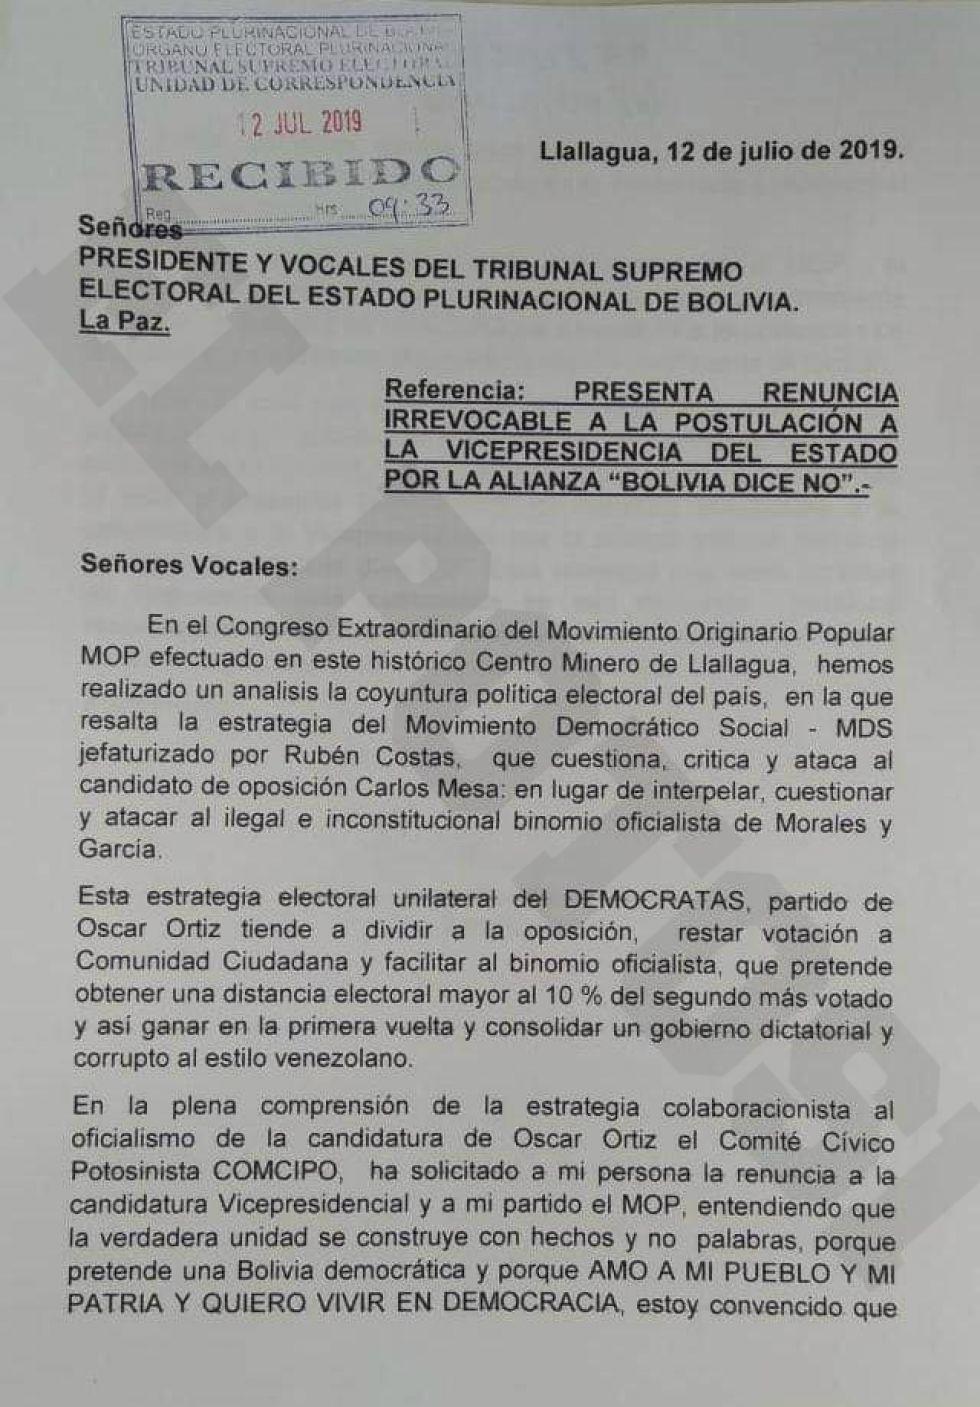 Edwin Rodríguez denuncia colaboracionismo de Óscar Ortiz